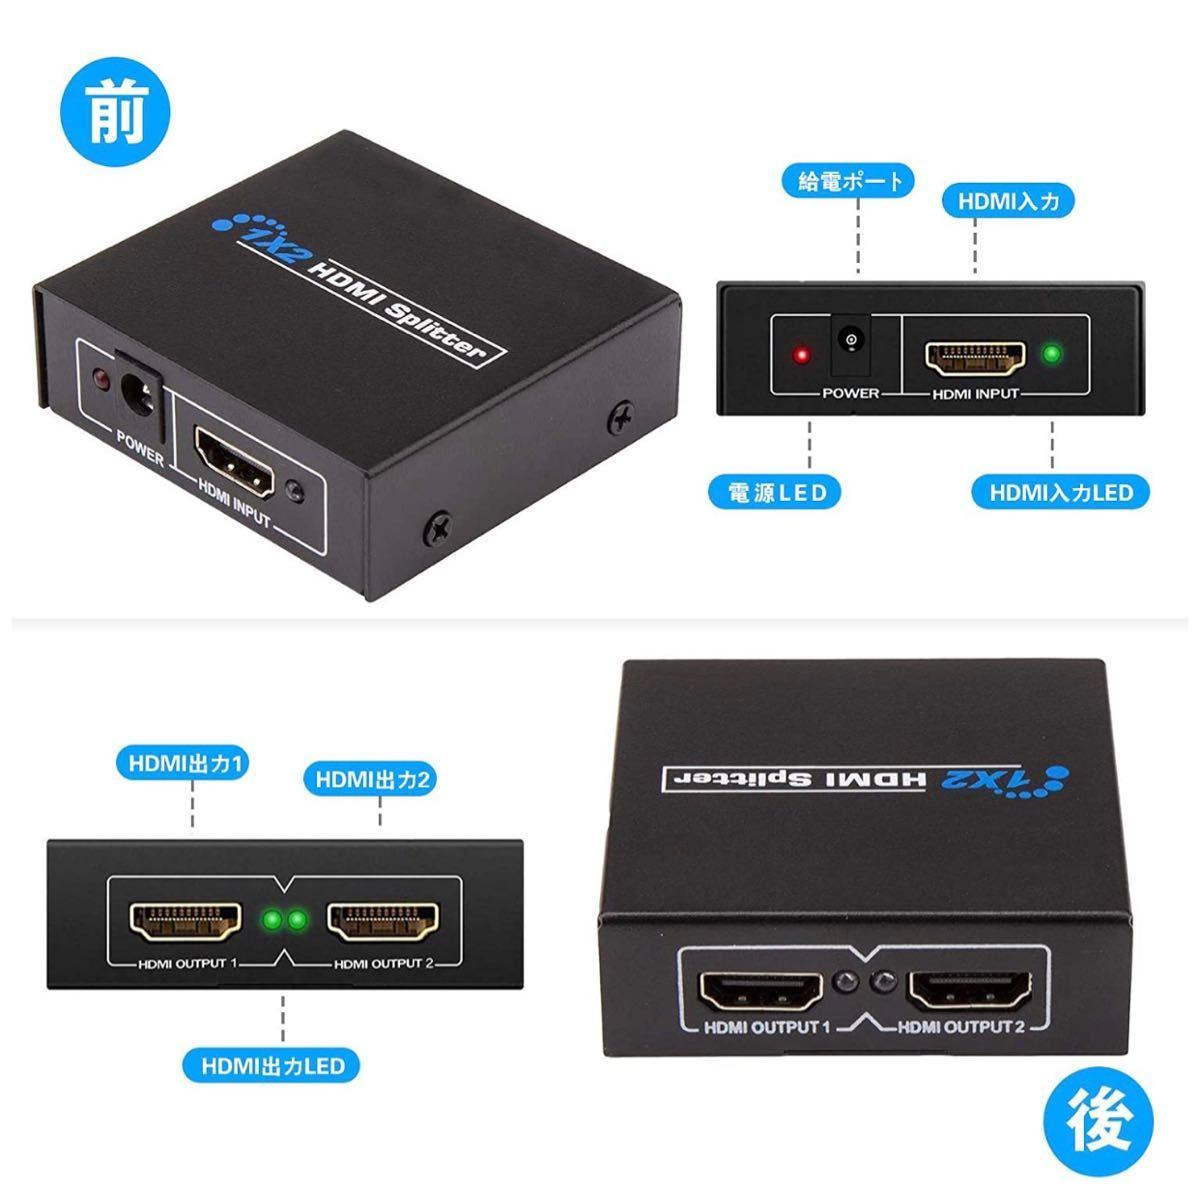 HDMI 分配器 1入力2出力 HDMIスプリッター HDMI 切替器 4K